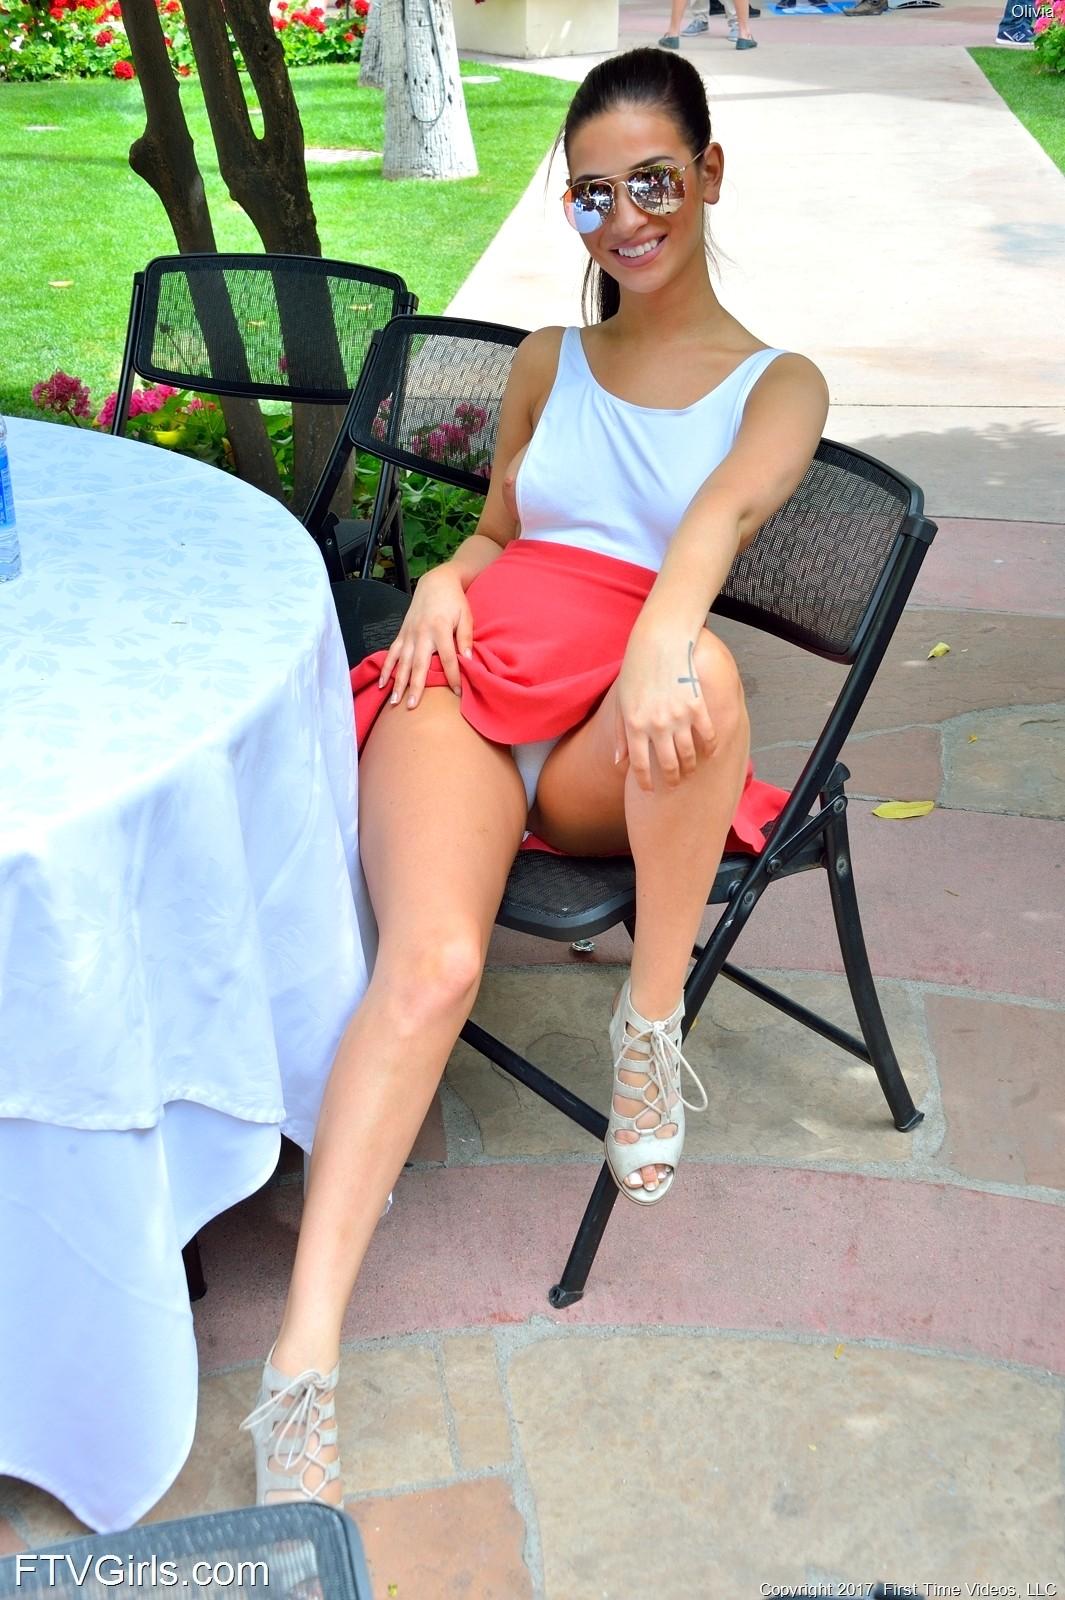 Babe Today Ftv Girls Olivia Nova General Flashing Free -8186